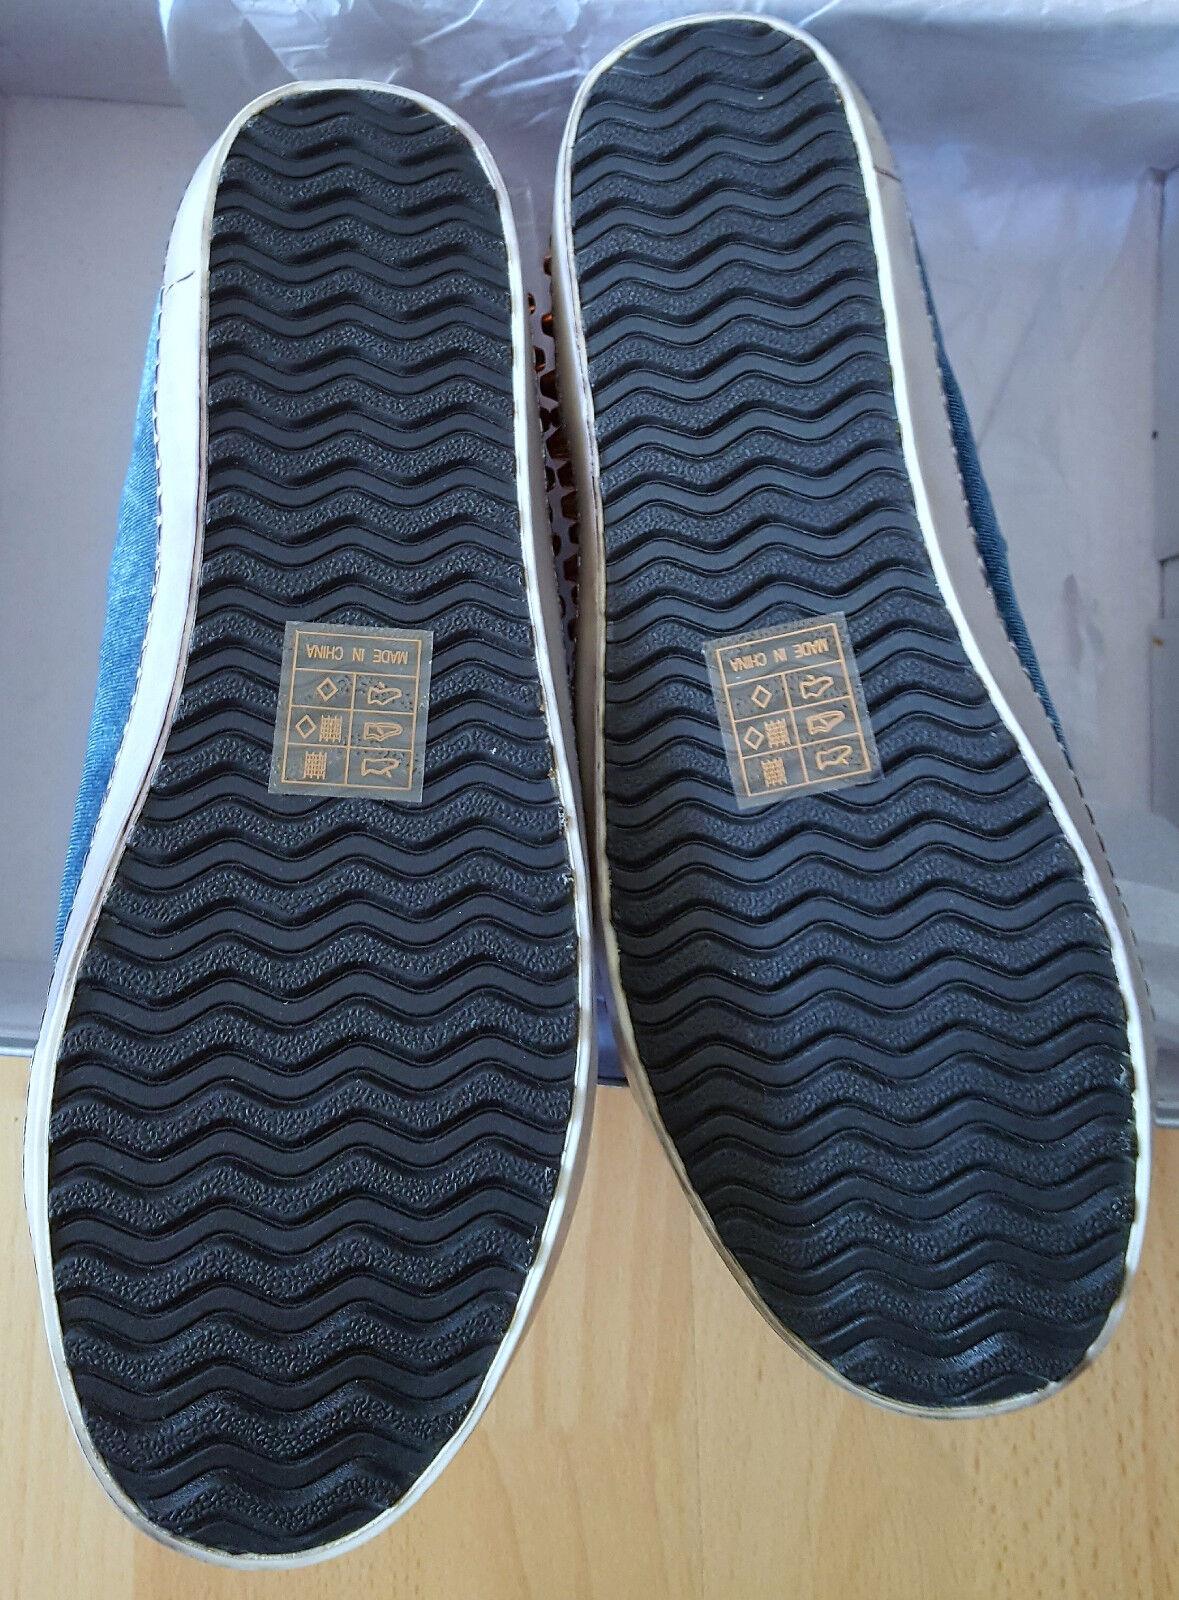 Sneakers Kupfer 38 Samt Petrol Nieten Kupfer Sneakers ungetragen Farbes of California high top e8f5d7